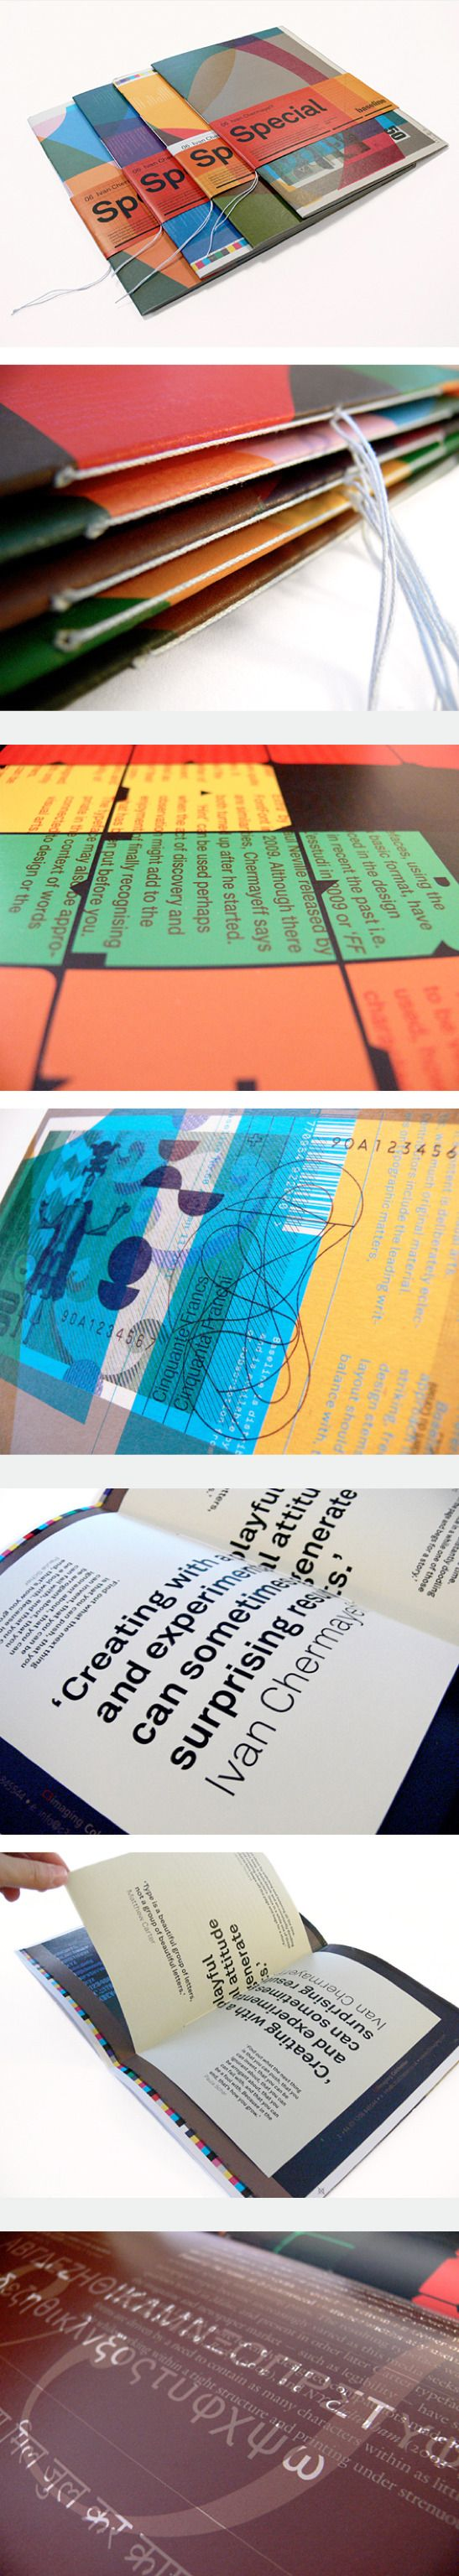 Baseline Magazine Special Ivan Chermayeff